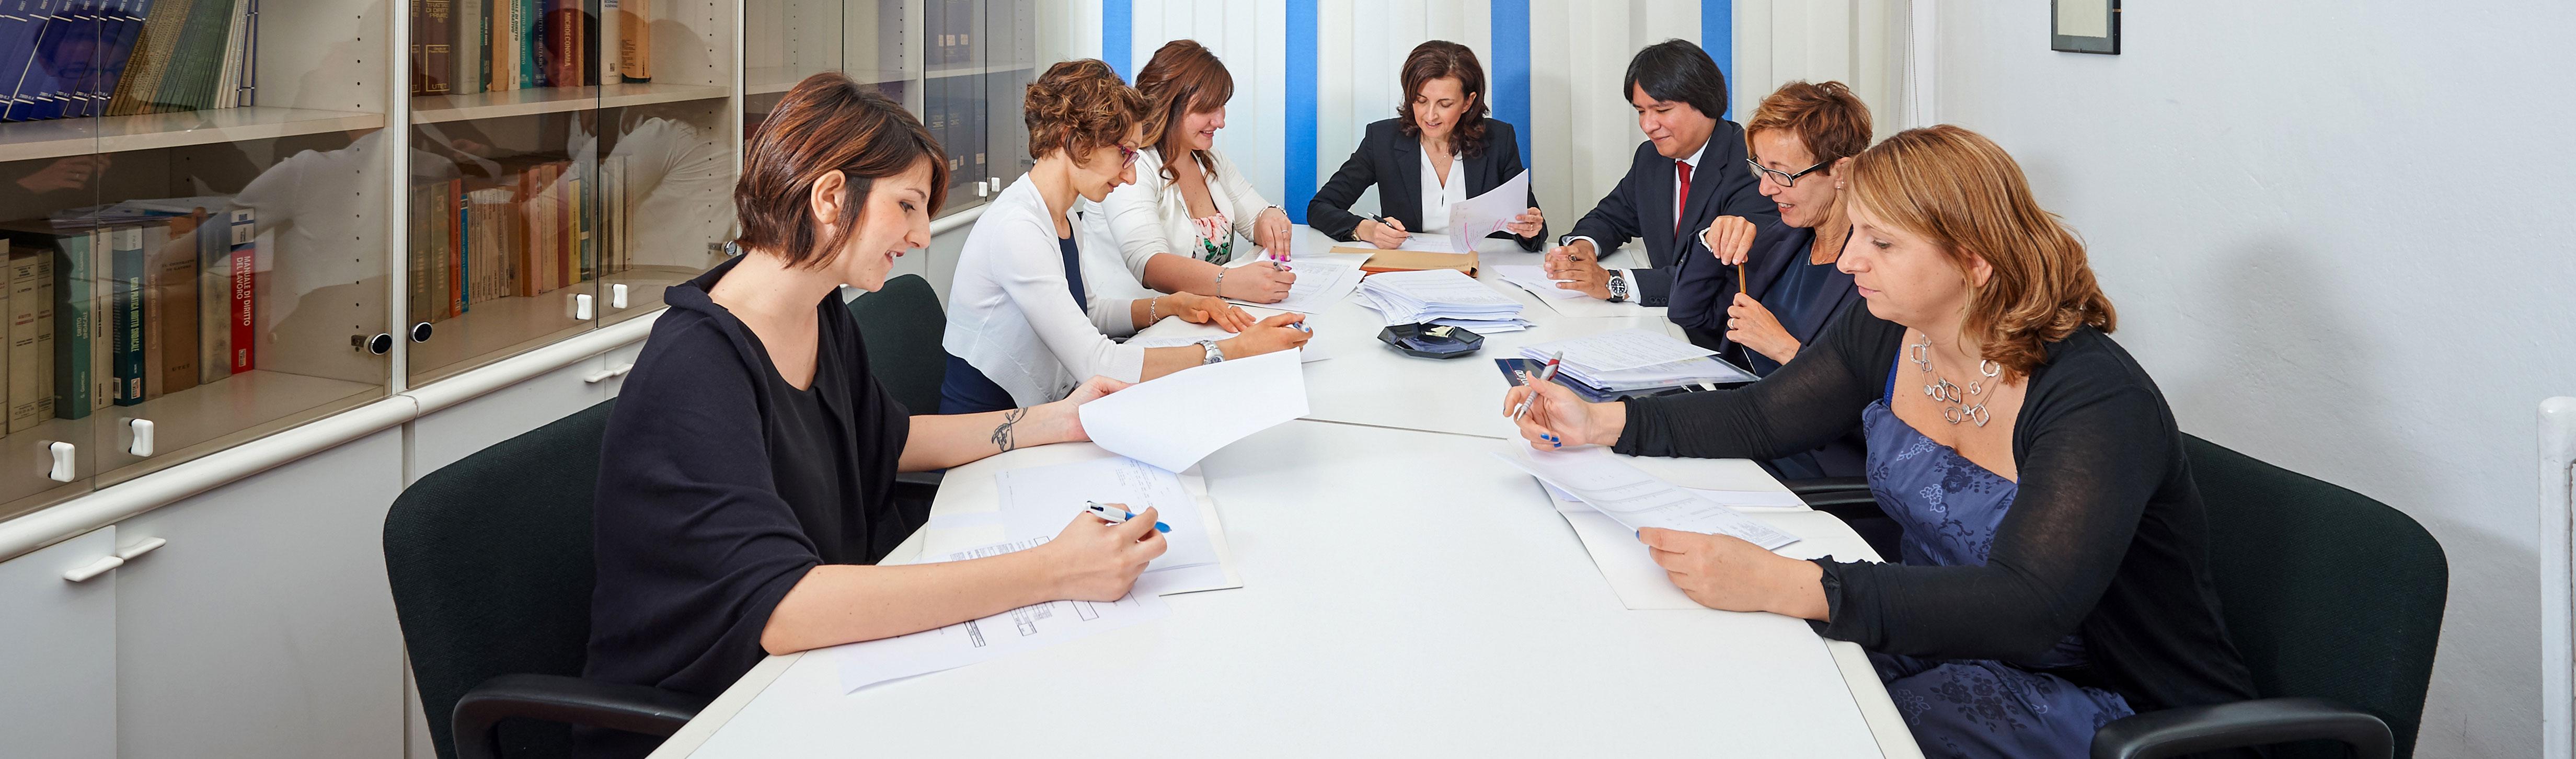 mondolavoro Novara, consulente del lavoro, consuelnza del lavoro, mondo lavoro novara, studio barberis novara